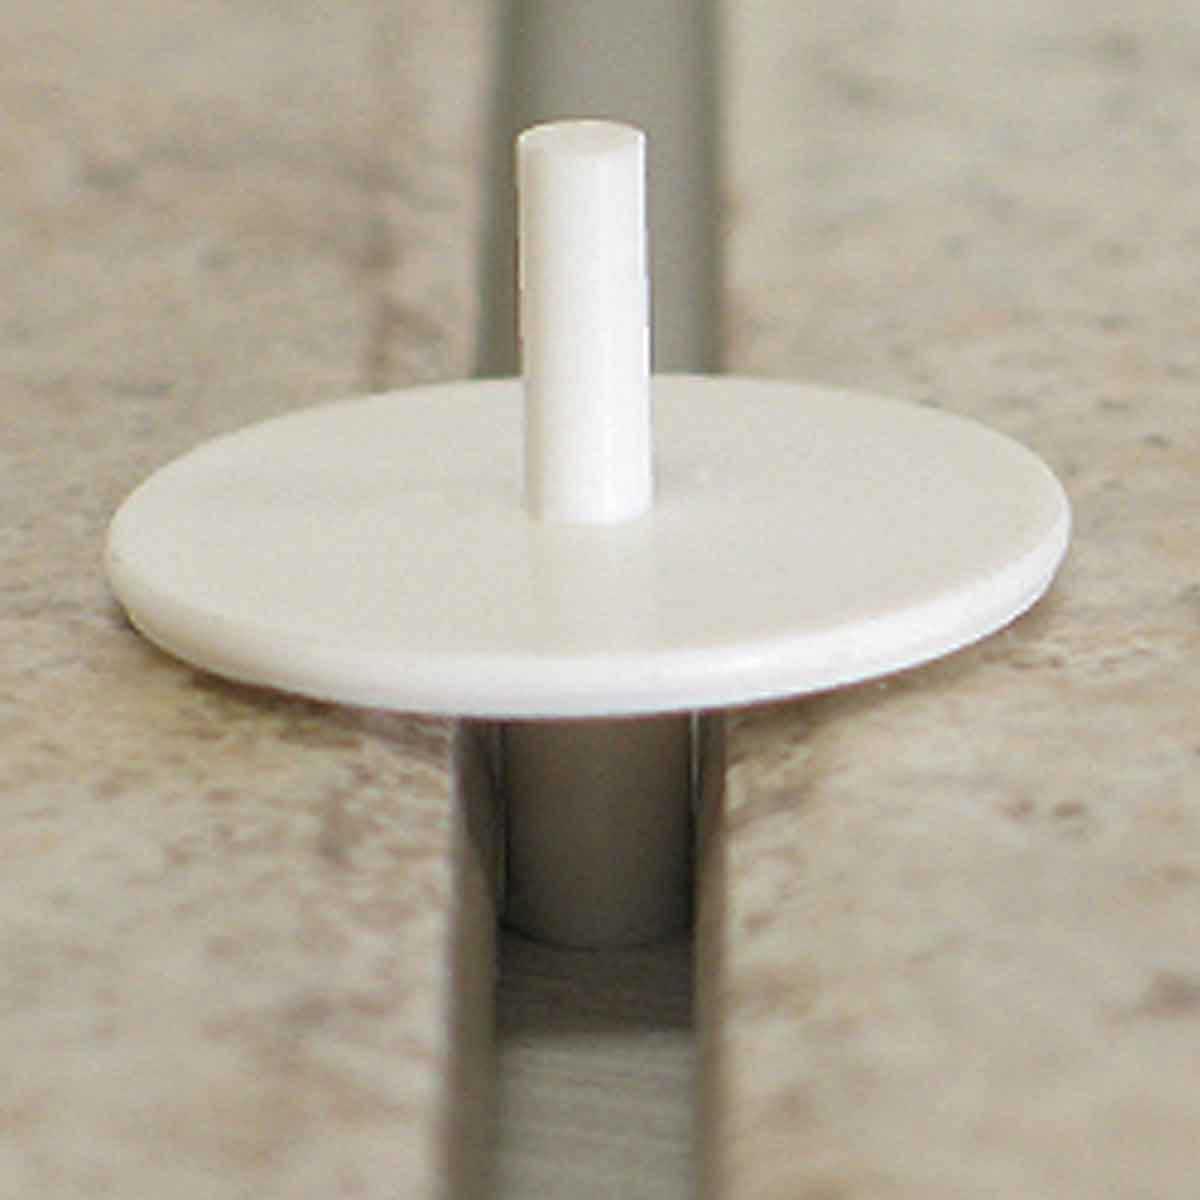 pearl abrasive smart tile spacer